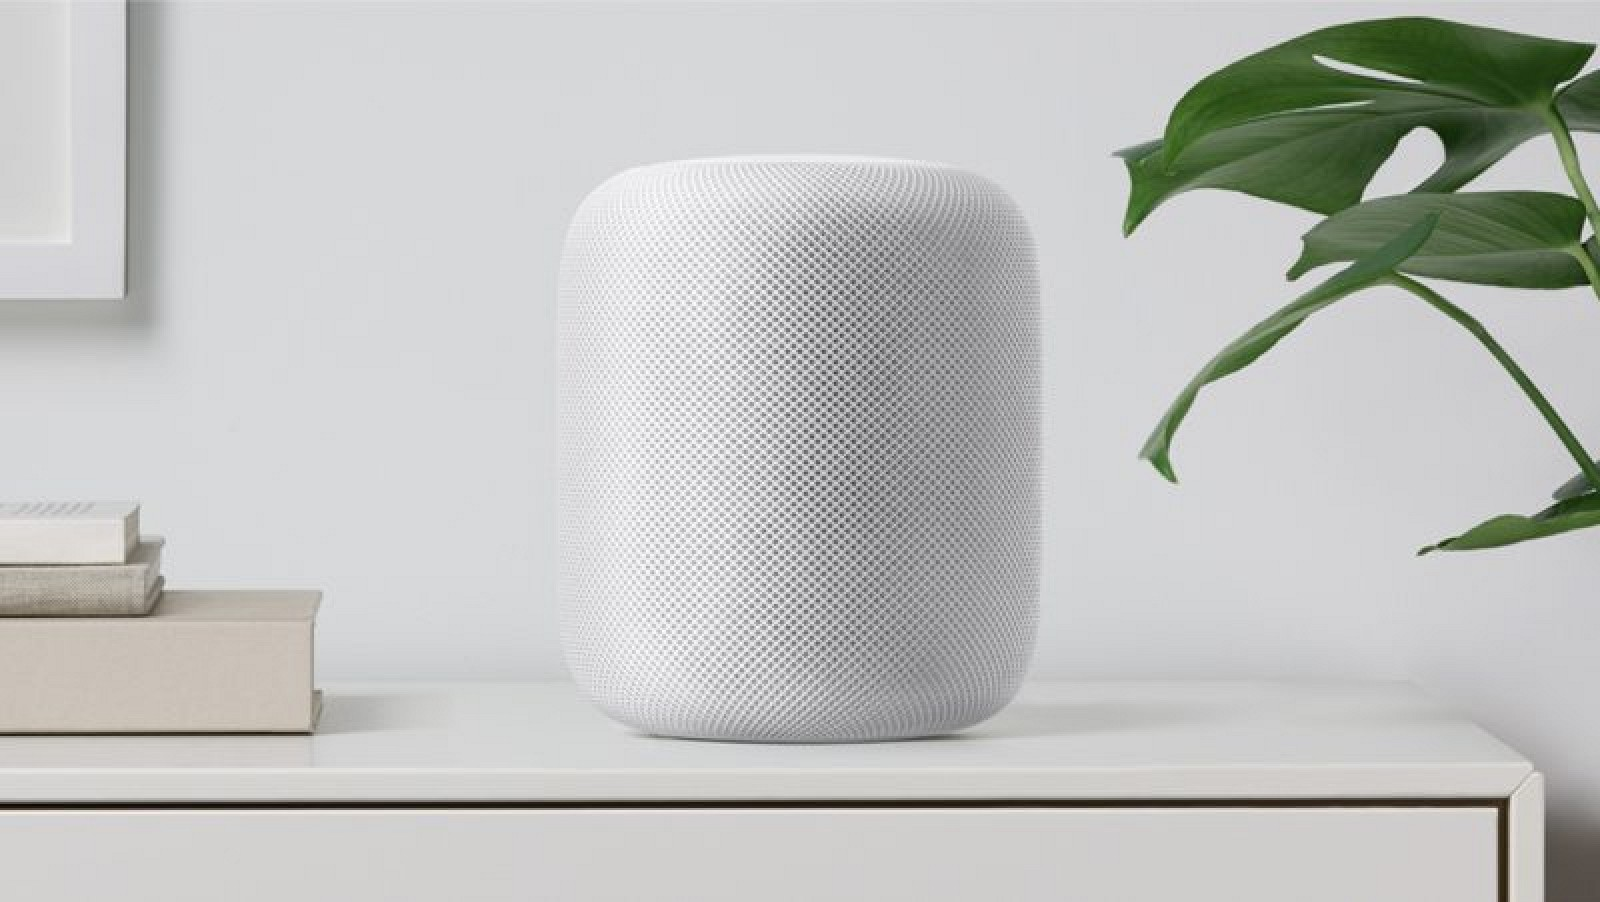 https://cdn.macrumors.com/article-new/2017/07/HomePod-on-shelf-800x451.jpg